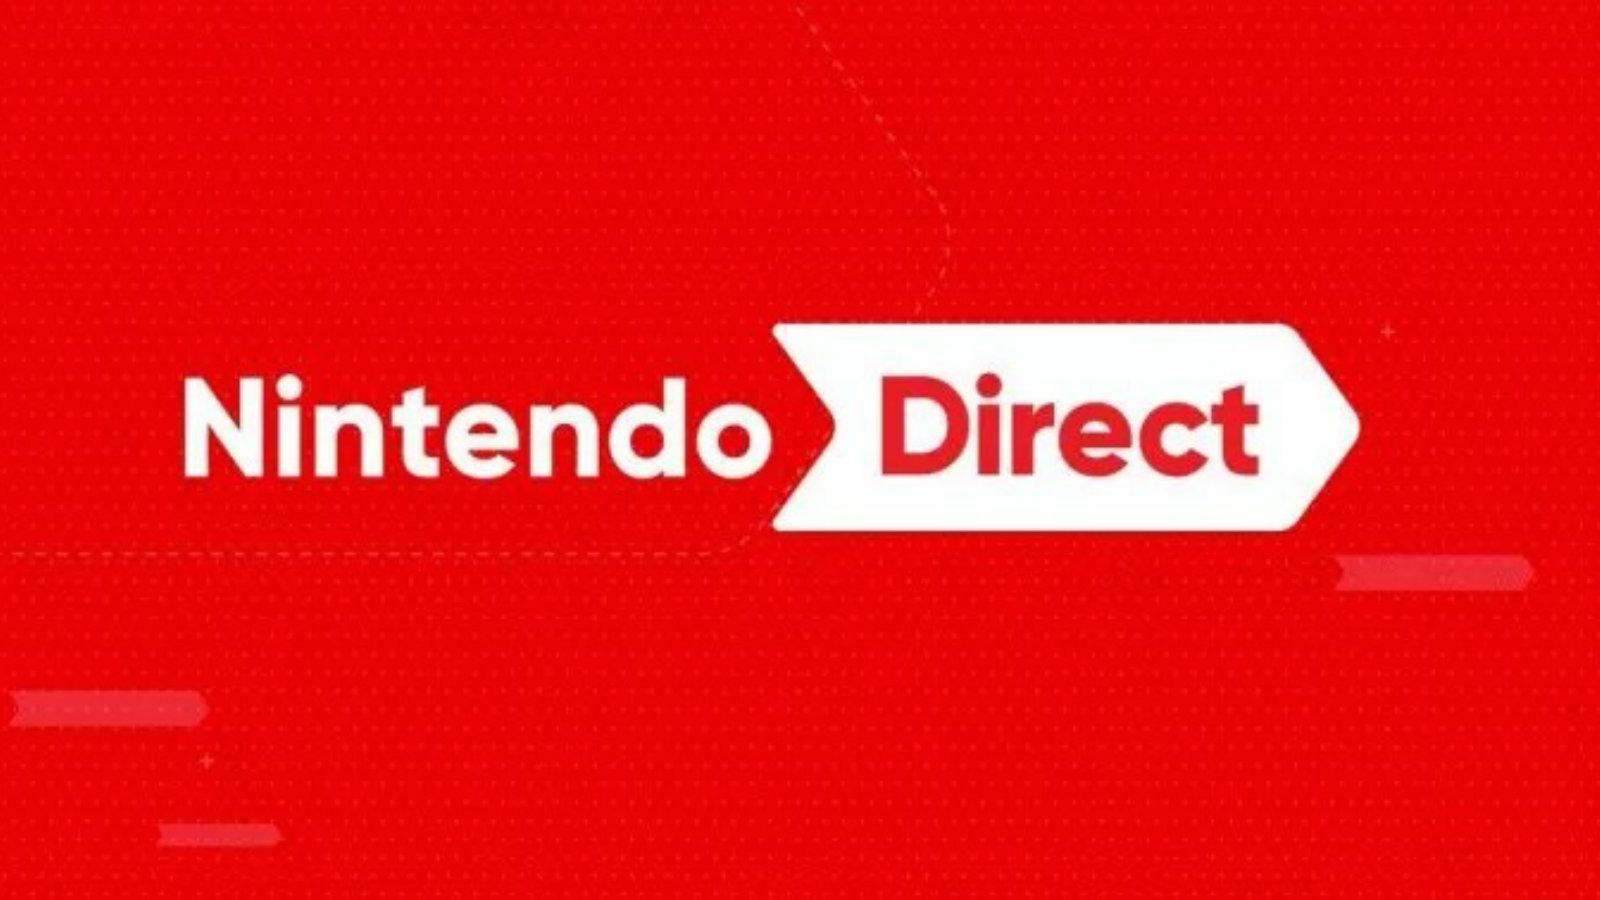 July Nintendo Direct screen